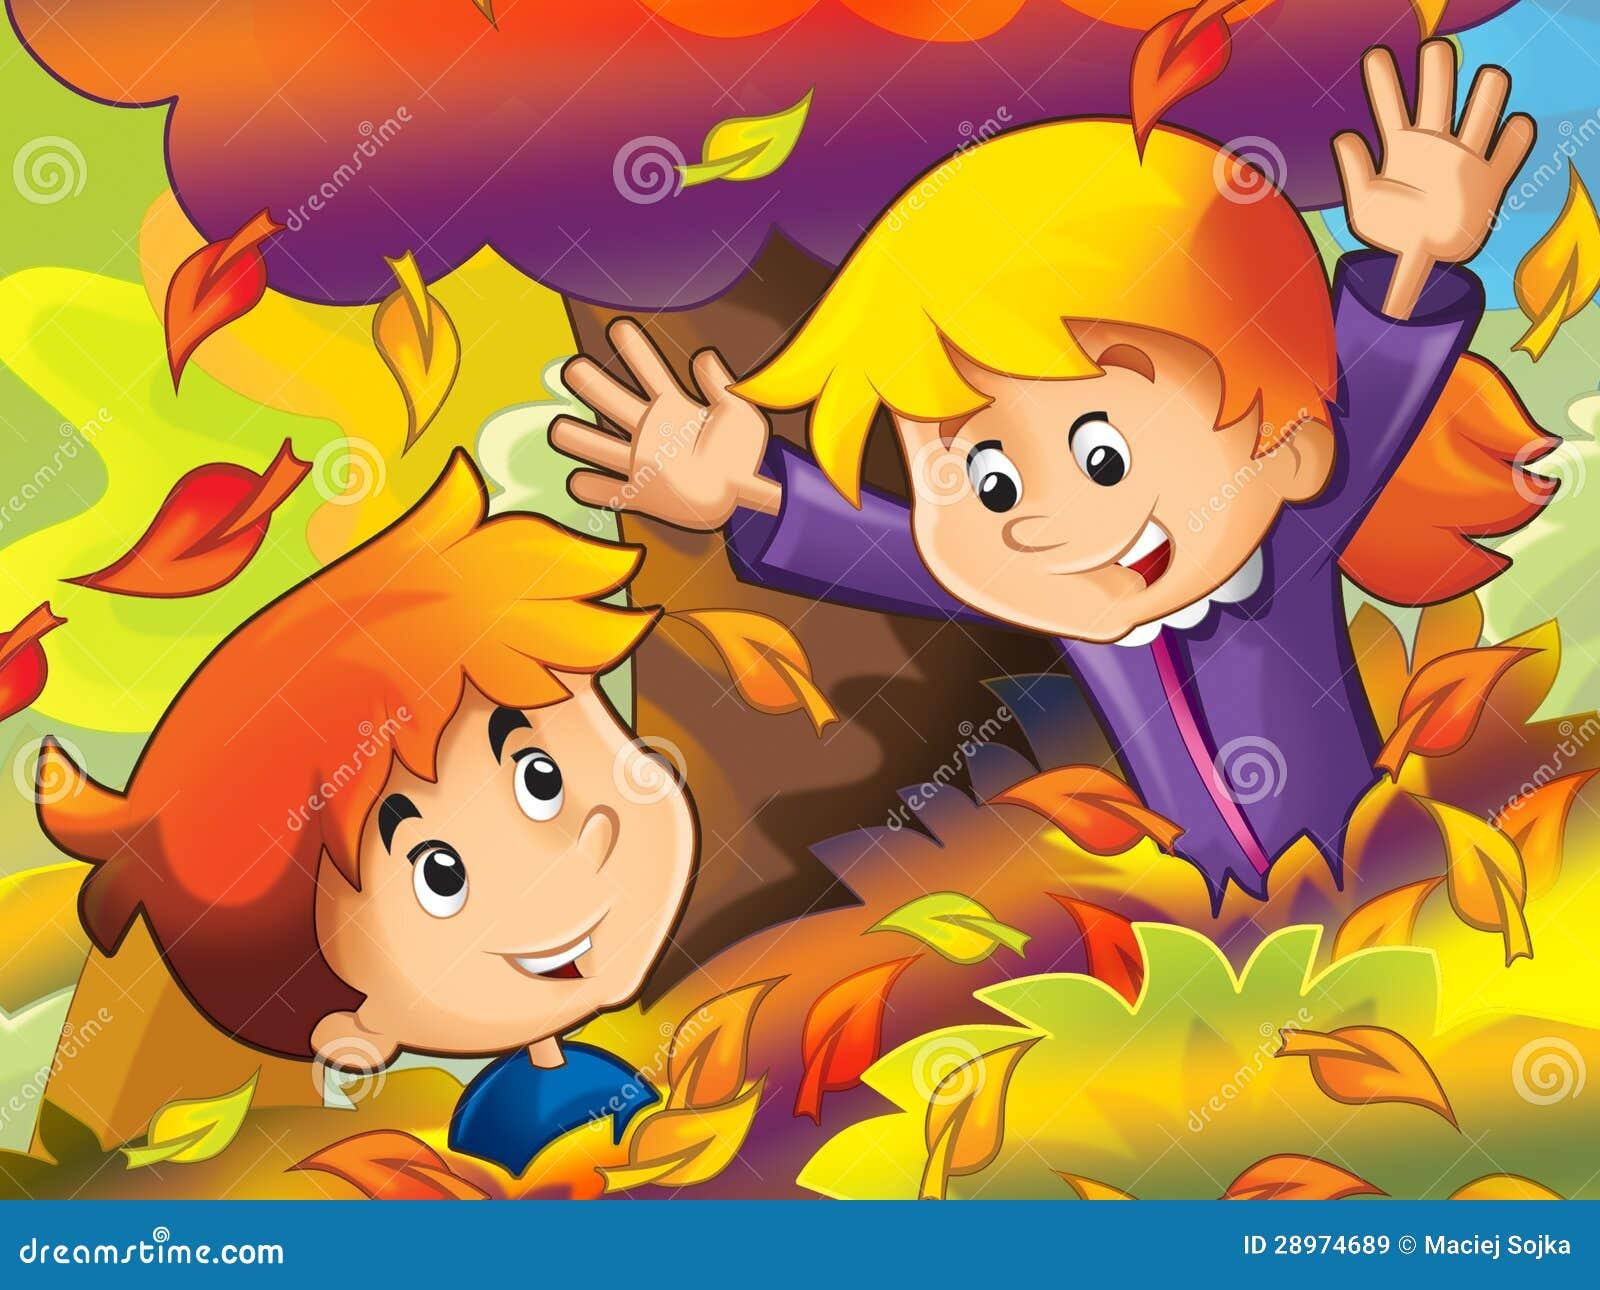 http://thumbs.dreamstime.com/z/cartoon-kids-playing-park-autumn-28974689.jpg